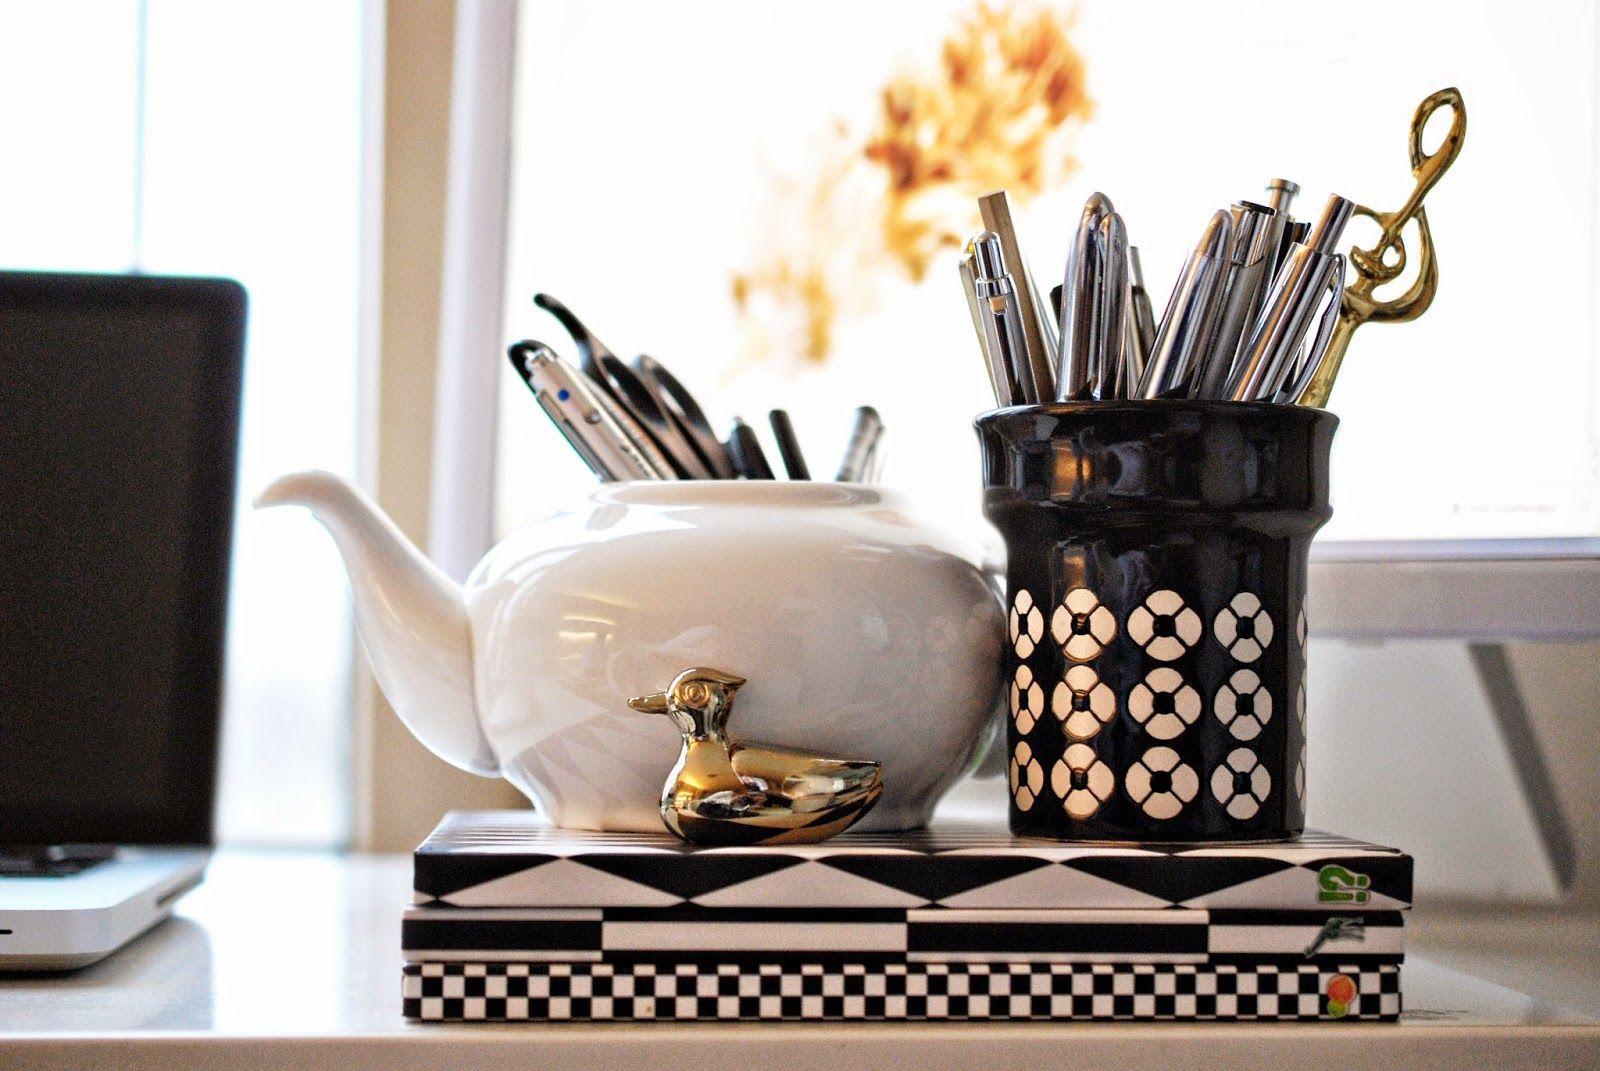 iby lippold haushaltstipps volle kanne im b ro haushalt organisieren. Black Bedroom Furniture Sets. Home Design Ideas